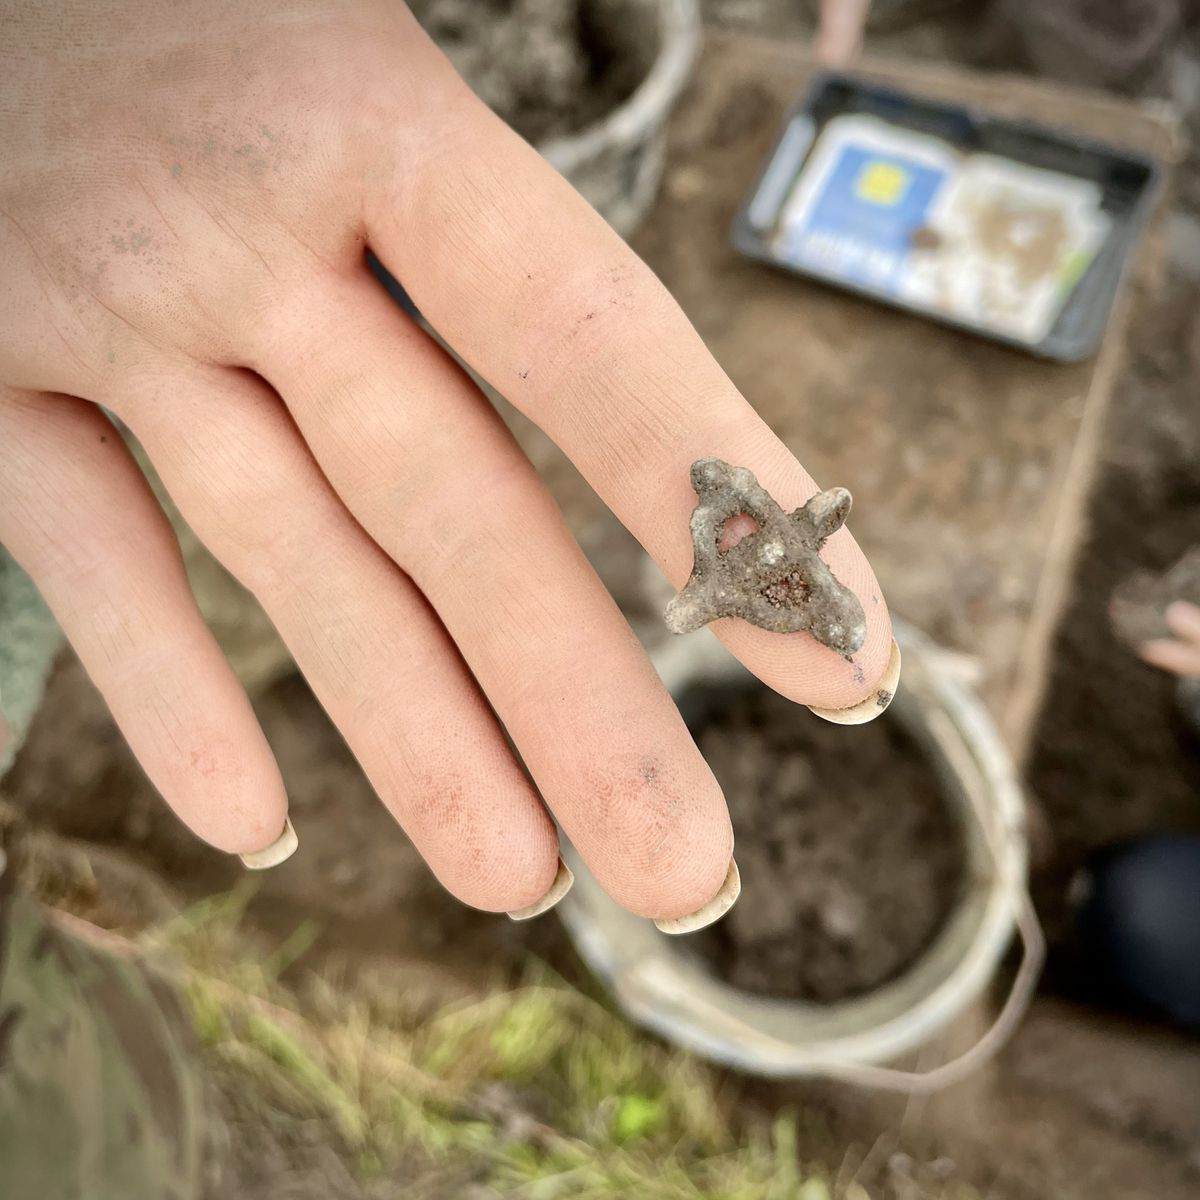 A pilgrim's badge found at Soulton Hall